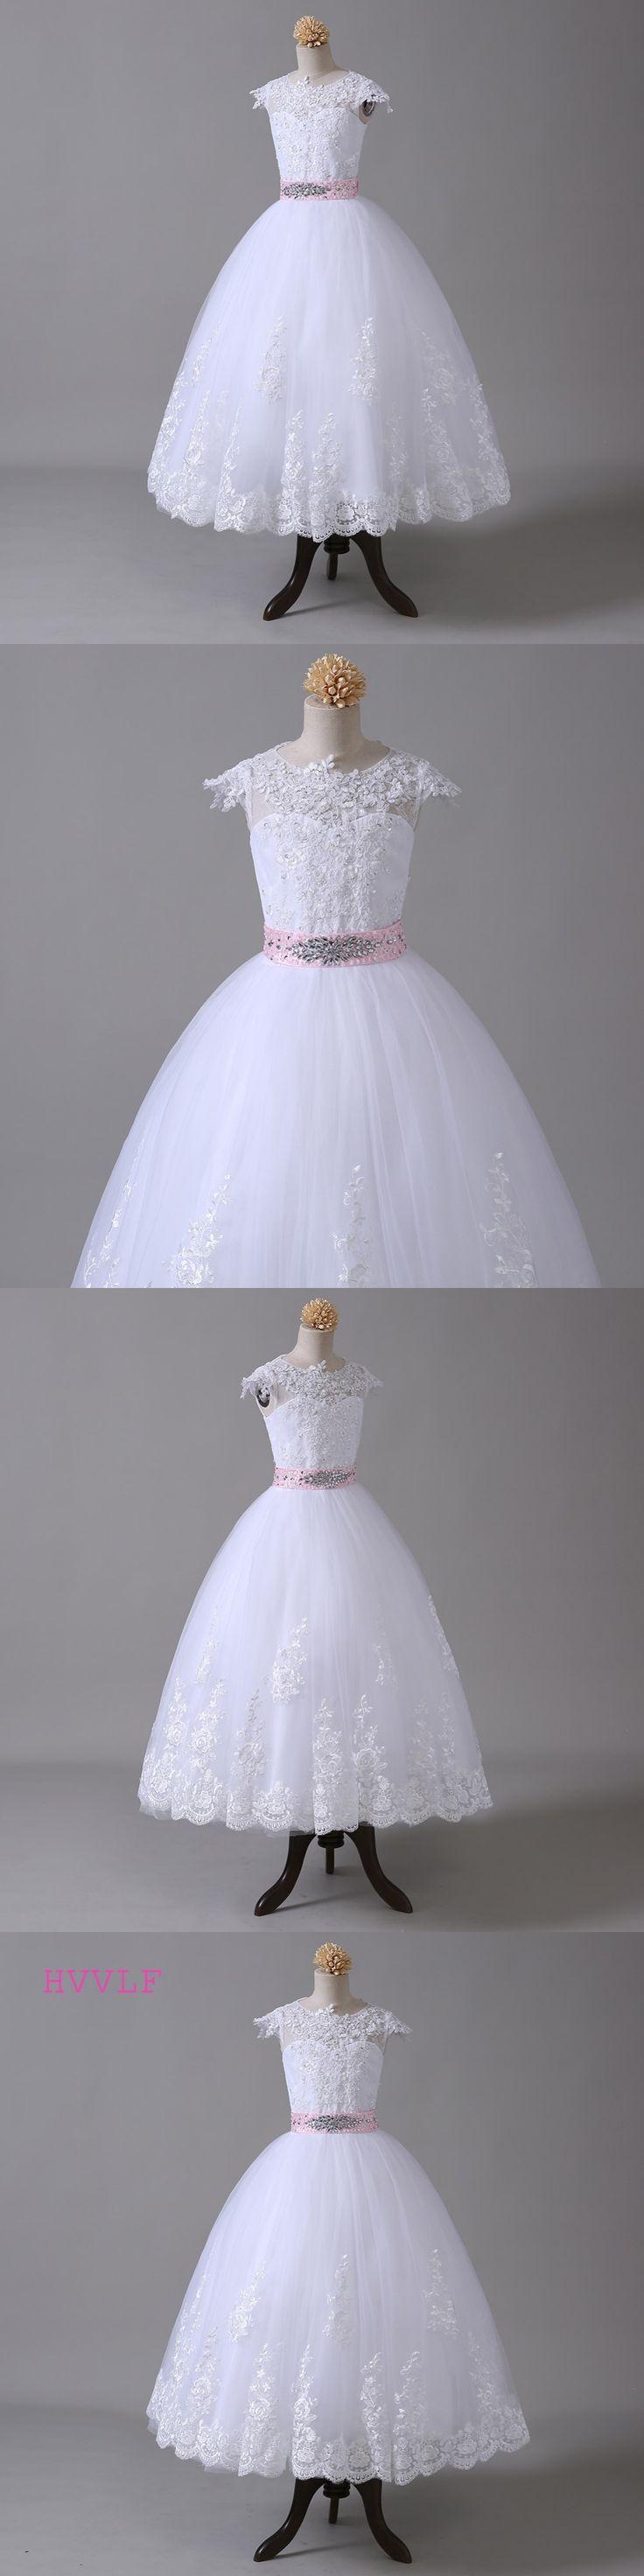 Ball Gown 2018 Flower Girl Dresses For Weddings Cap Sleeves Bow Lace Beaded First Communion Dresses For Little Girls